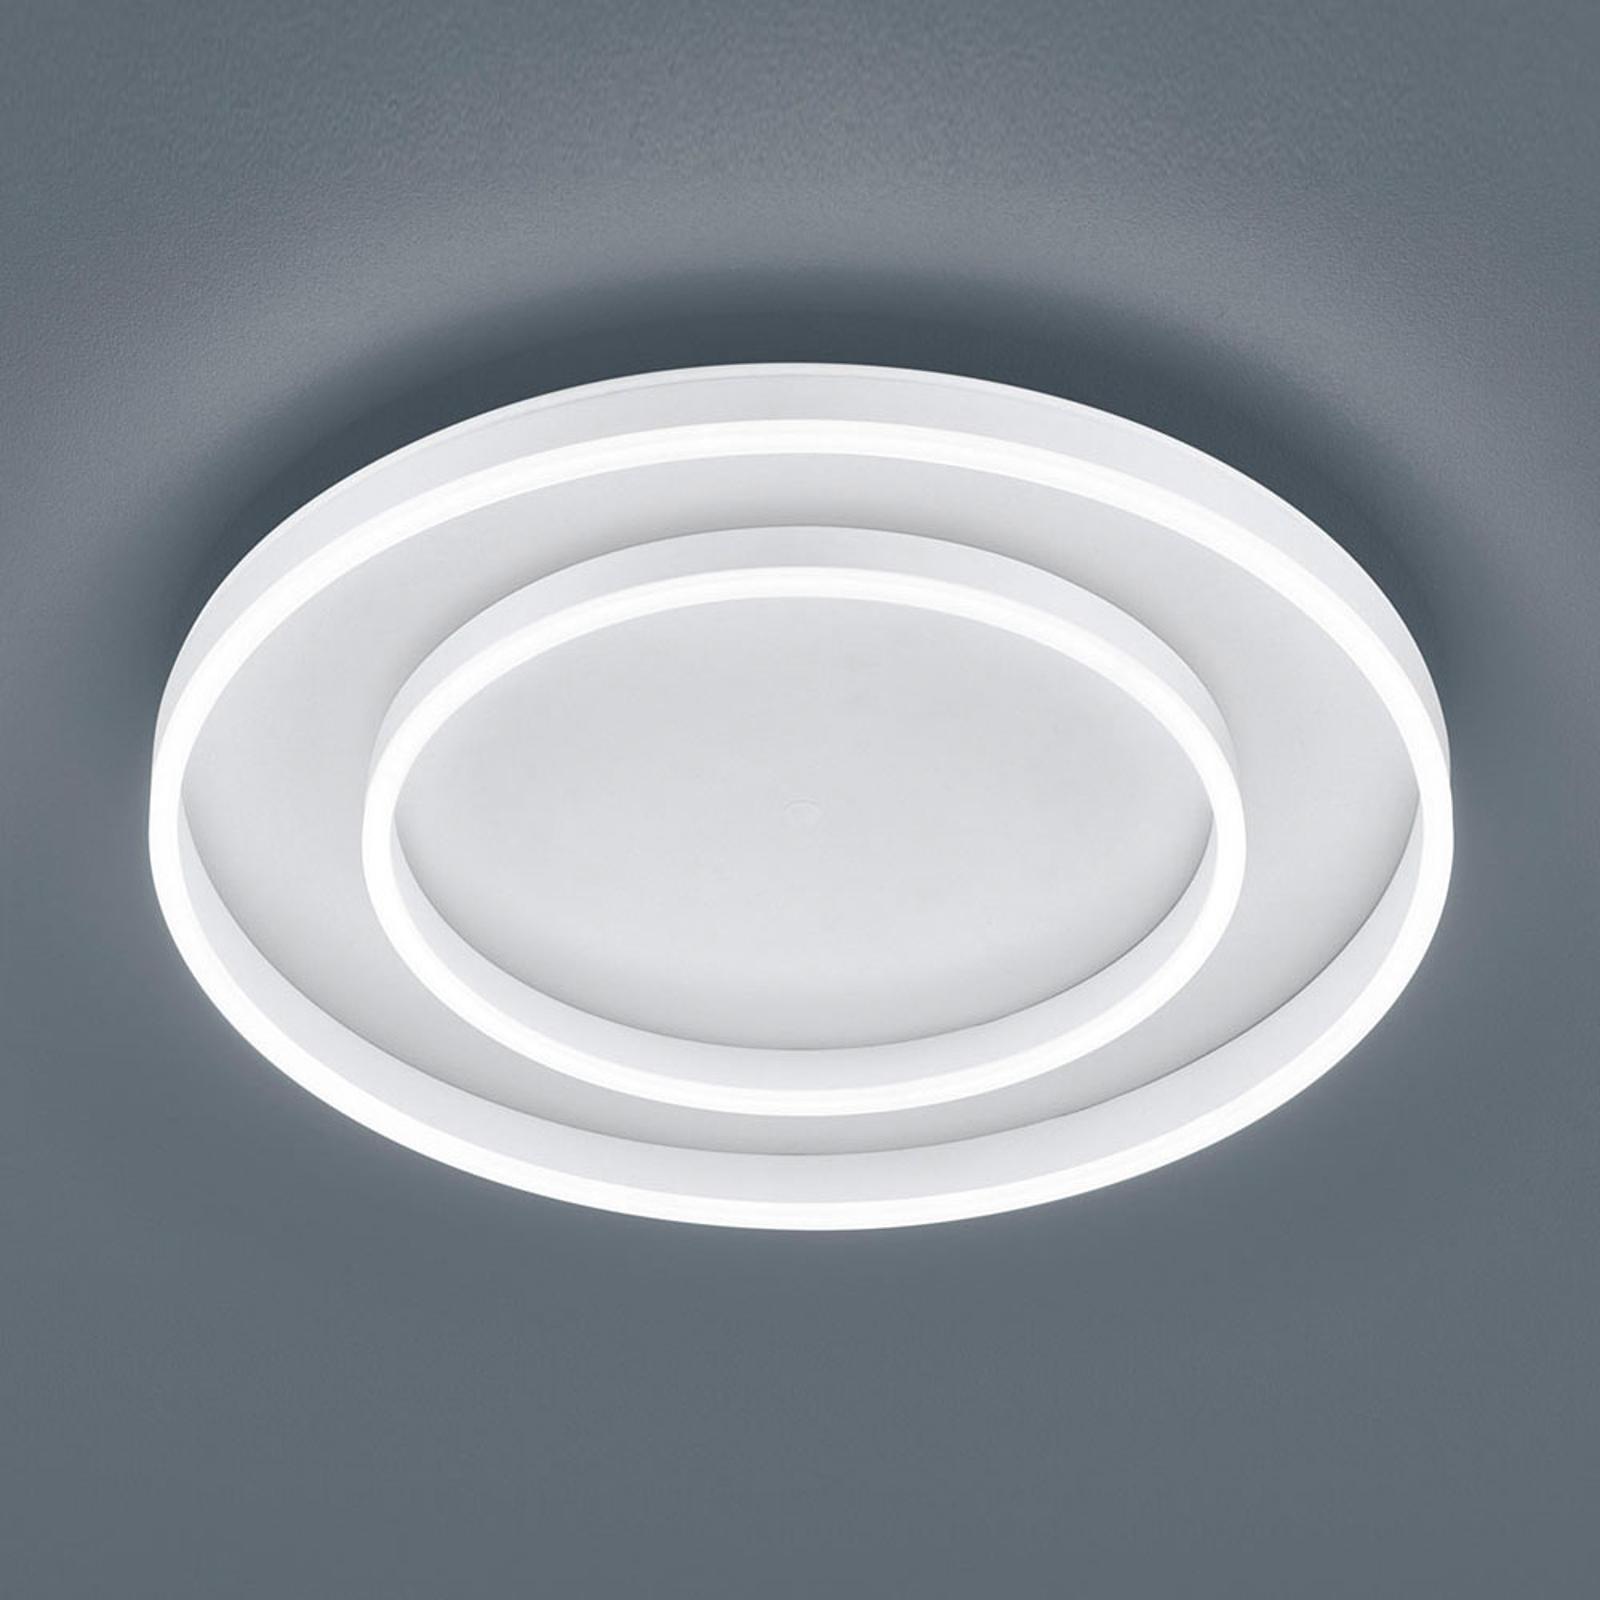 Helestra Sona LED-taklampe dimbar, Ø60cm hvit